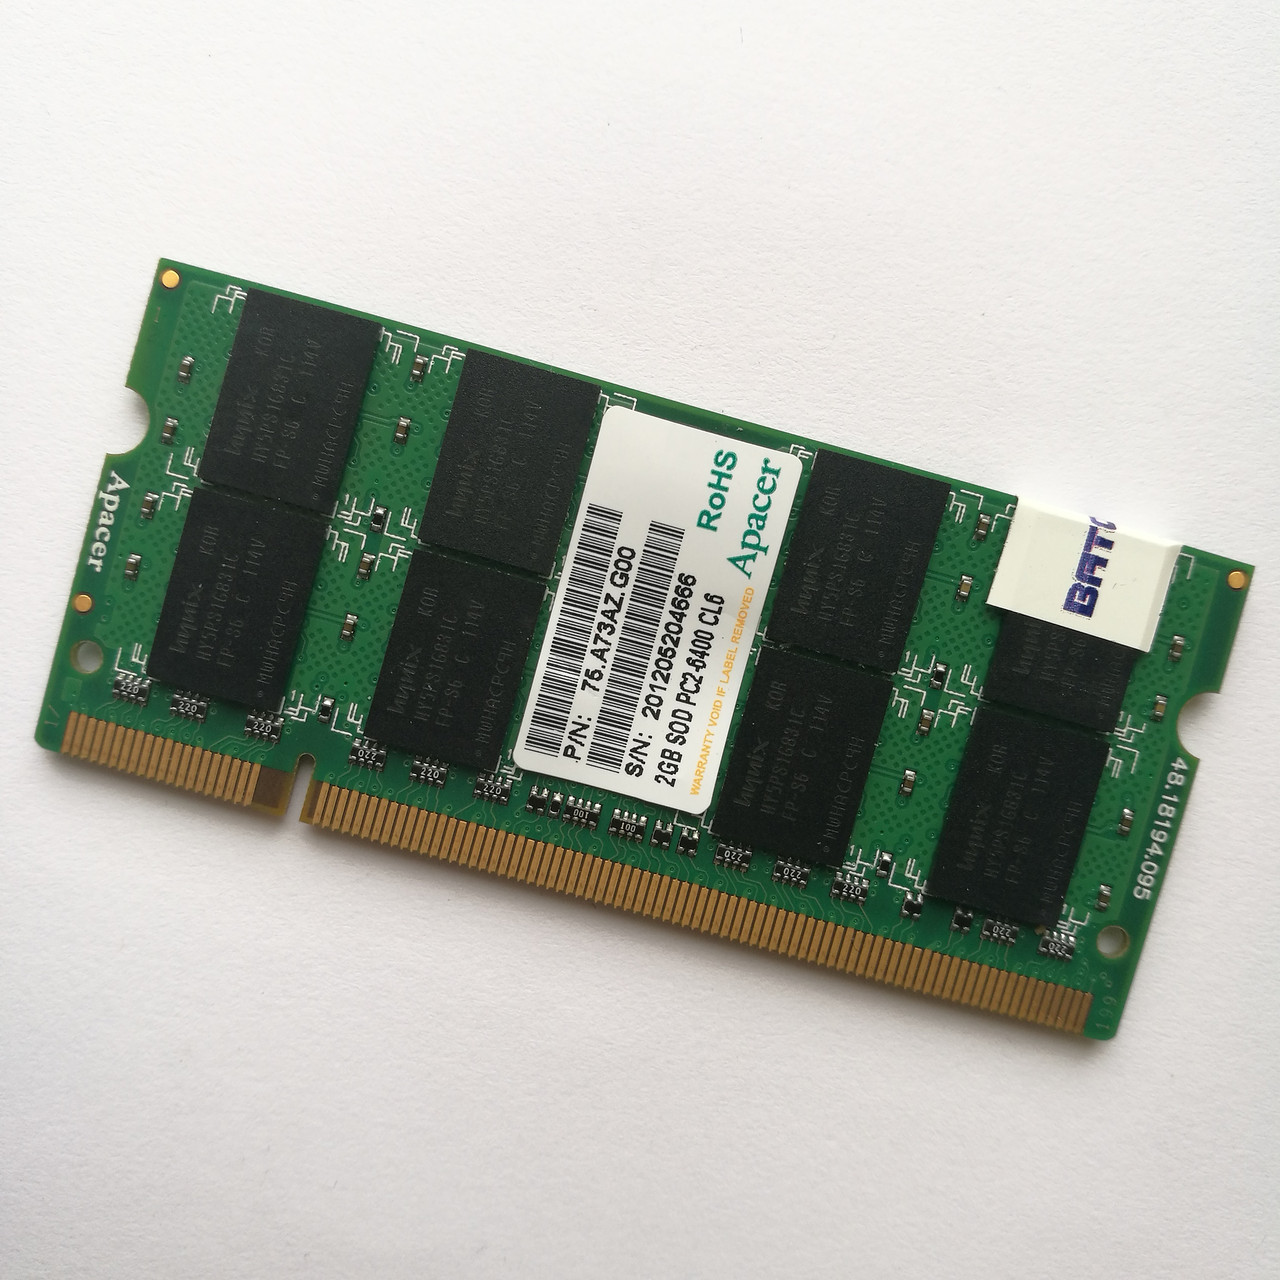 Оперативная память для ноутбука Apacer SODIMM DDR2 2Gb 800MHz 6400 CL6 (75.A73AZ.G00) Б/У